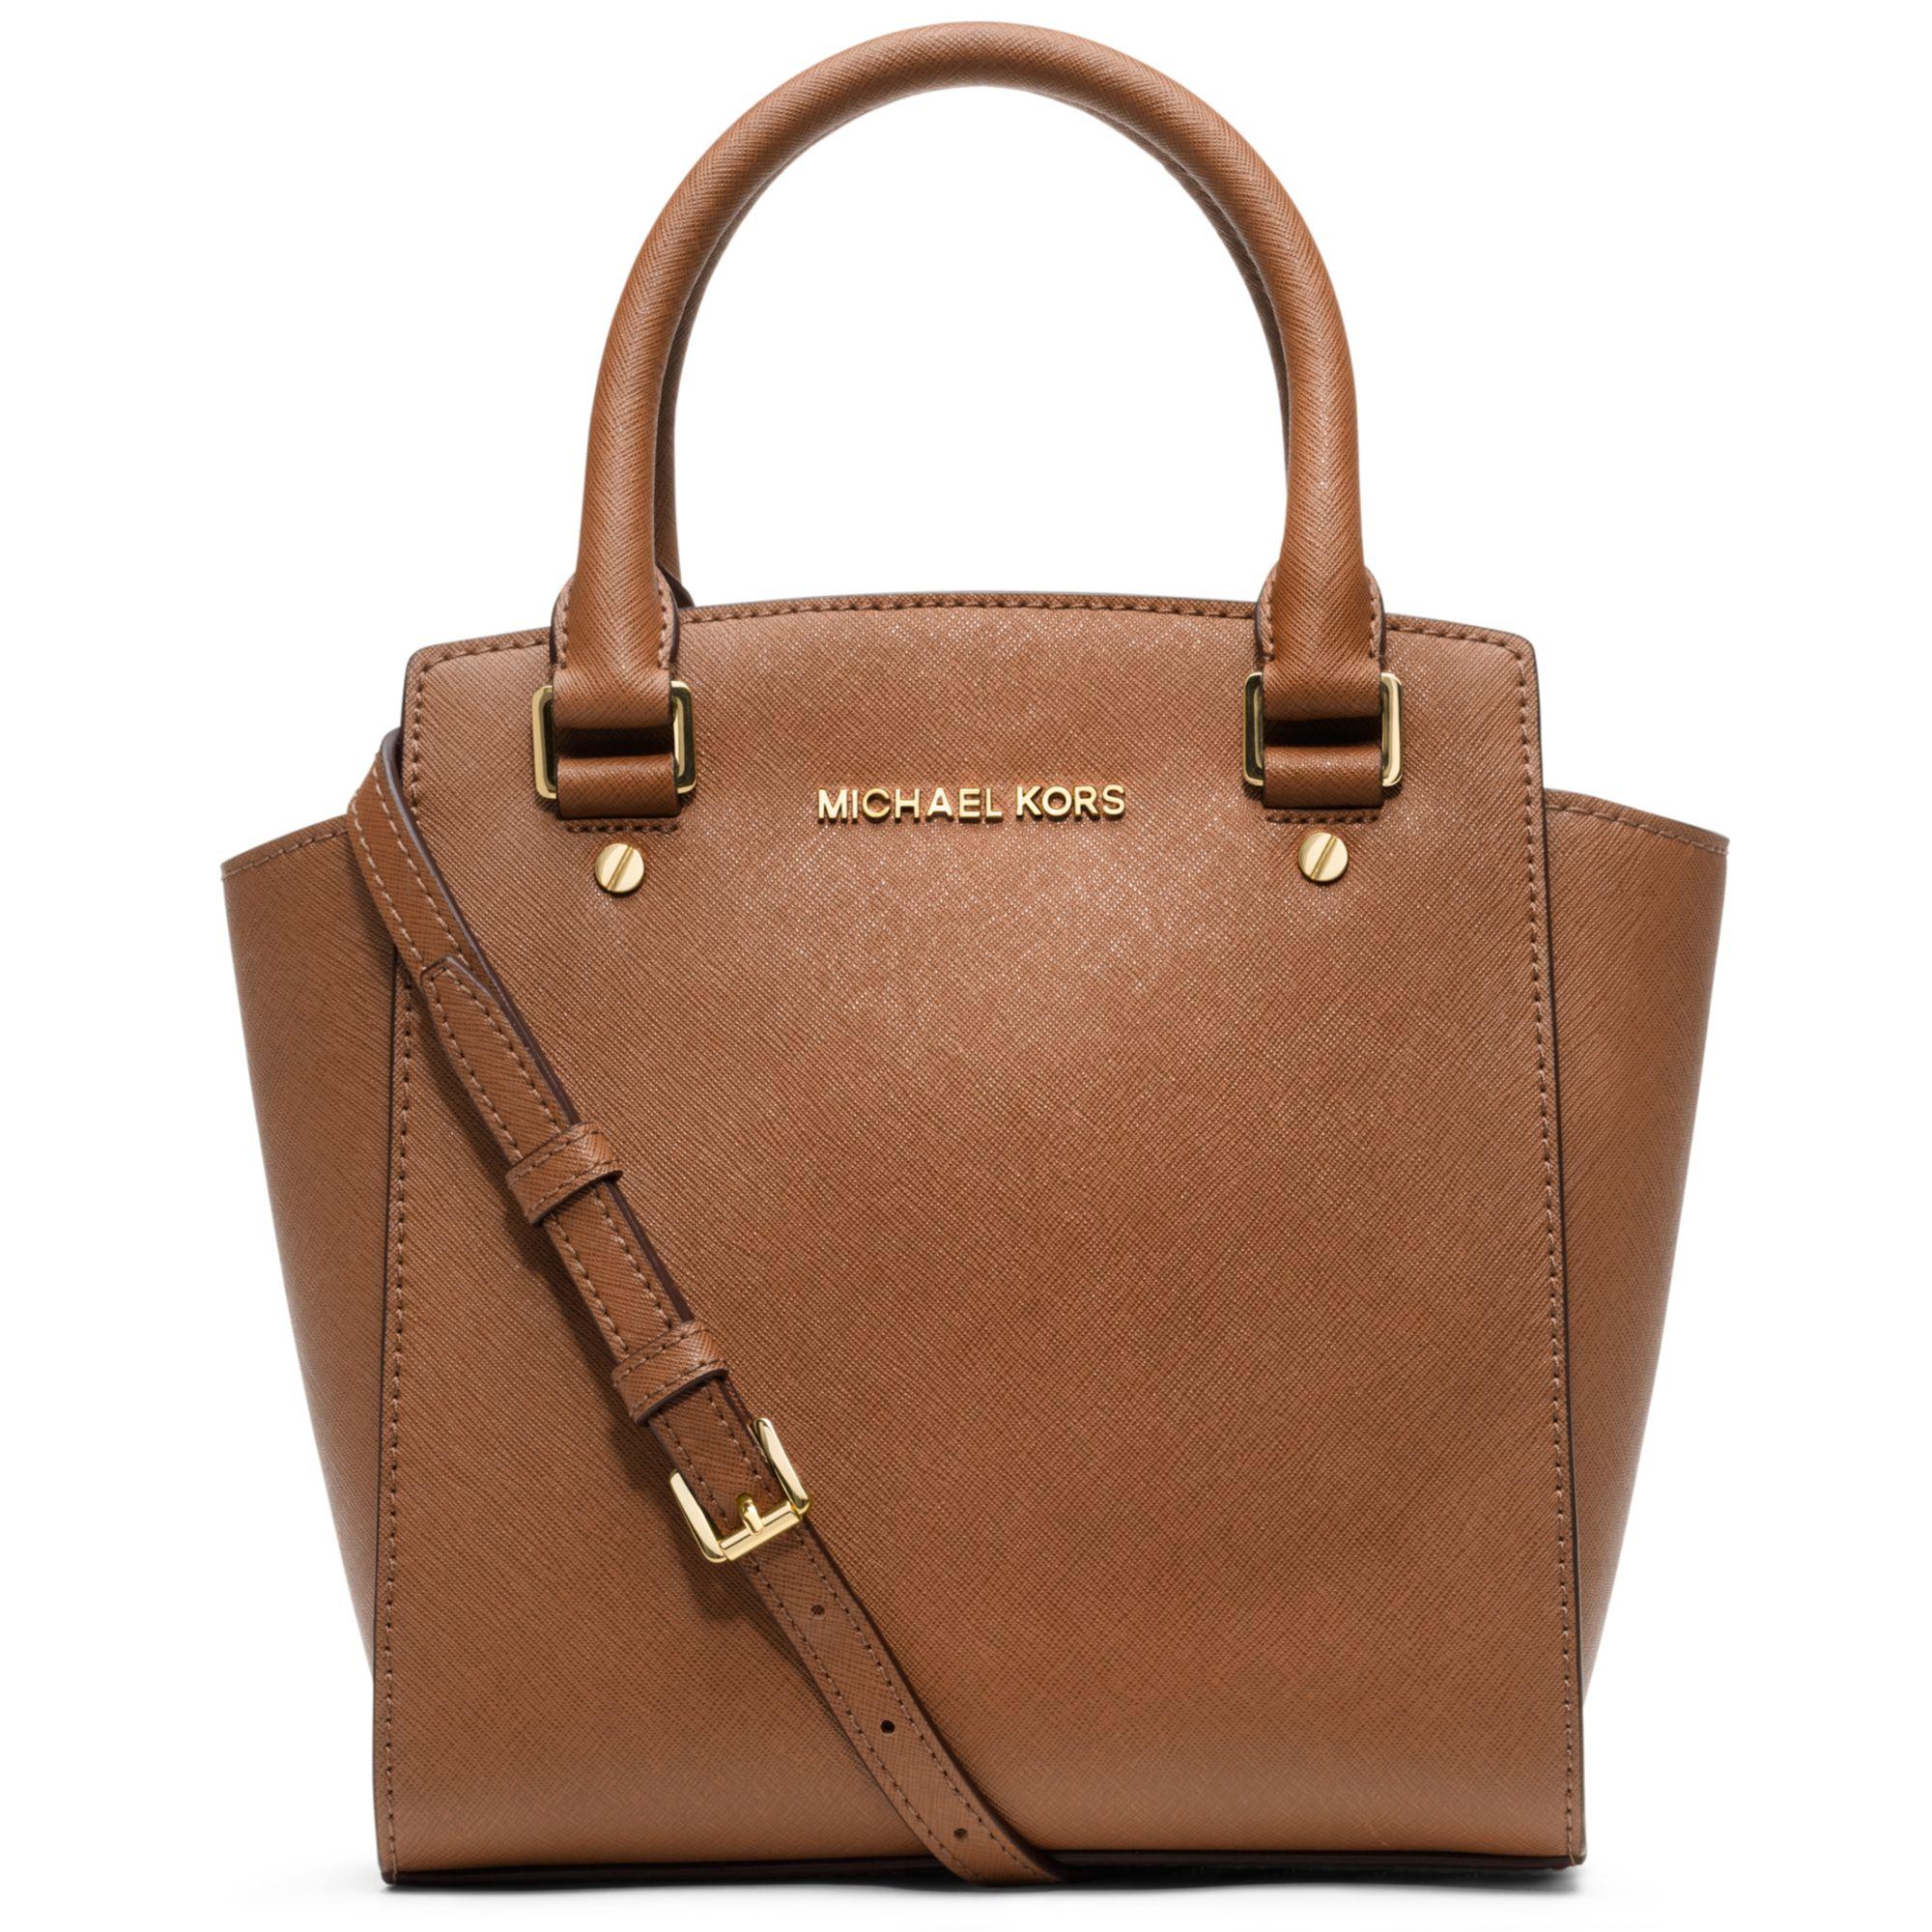 michael kors selma large messenger bag in brown luggage lyst. Black Bedroom Furniture Sets. Home Design Ideas